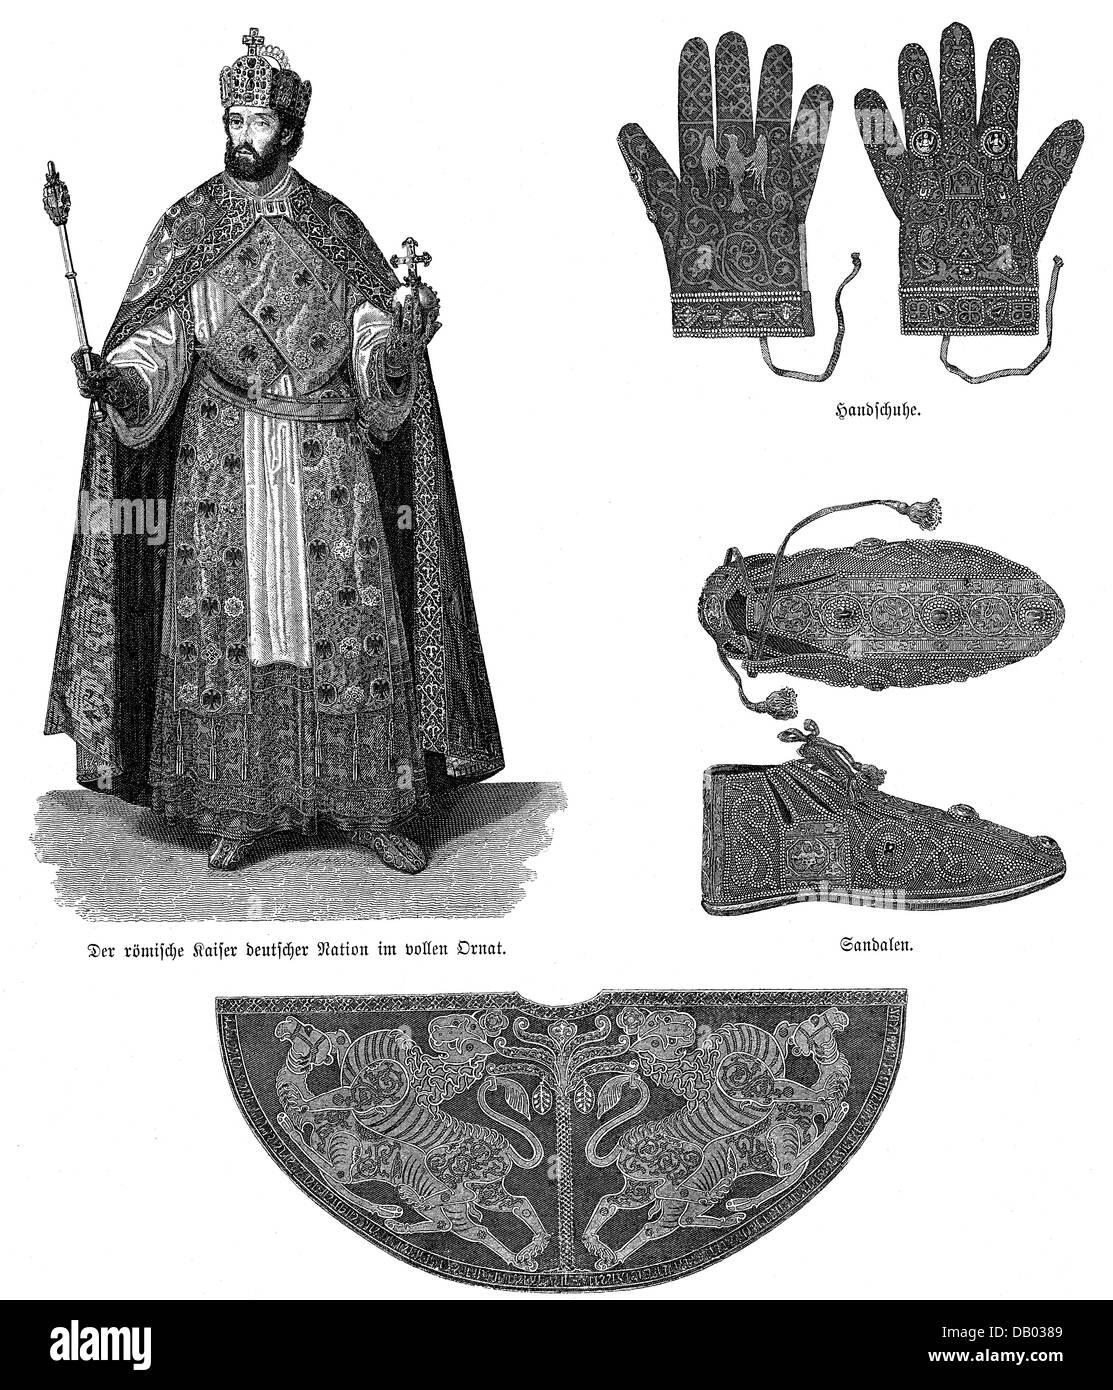 jewellery, crown jewels, Imperial Regalia, Holy Roman Empire, regalia, glove, gloves, sandal, sandals, Pluviale, - Stock Image